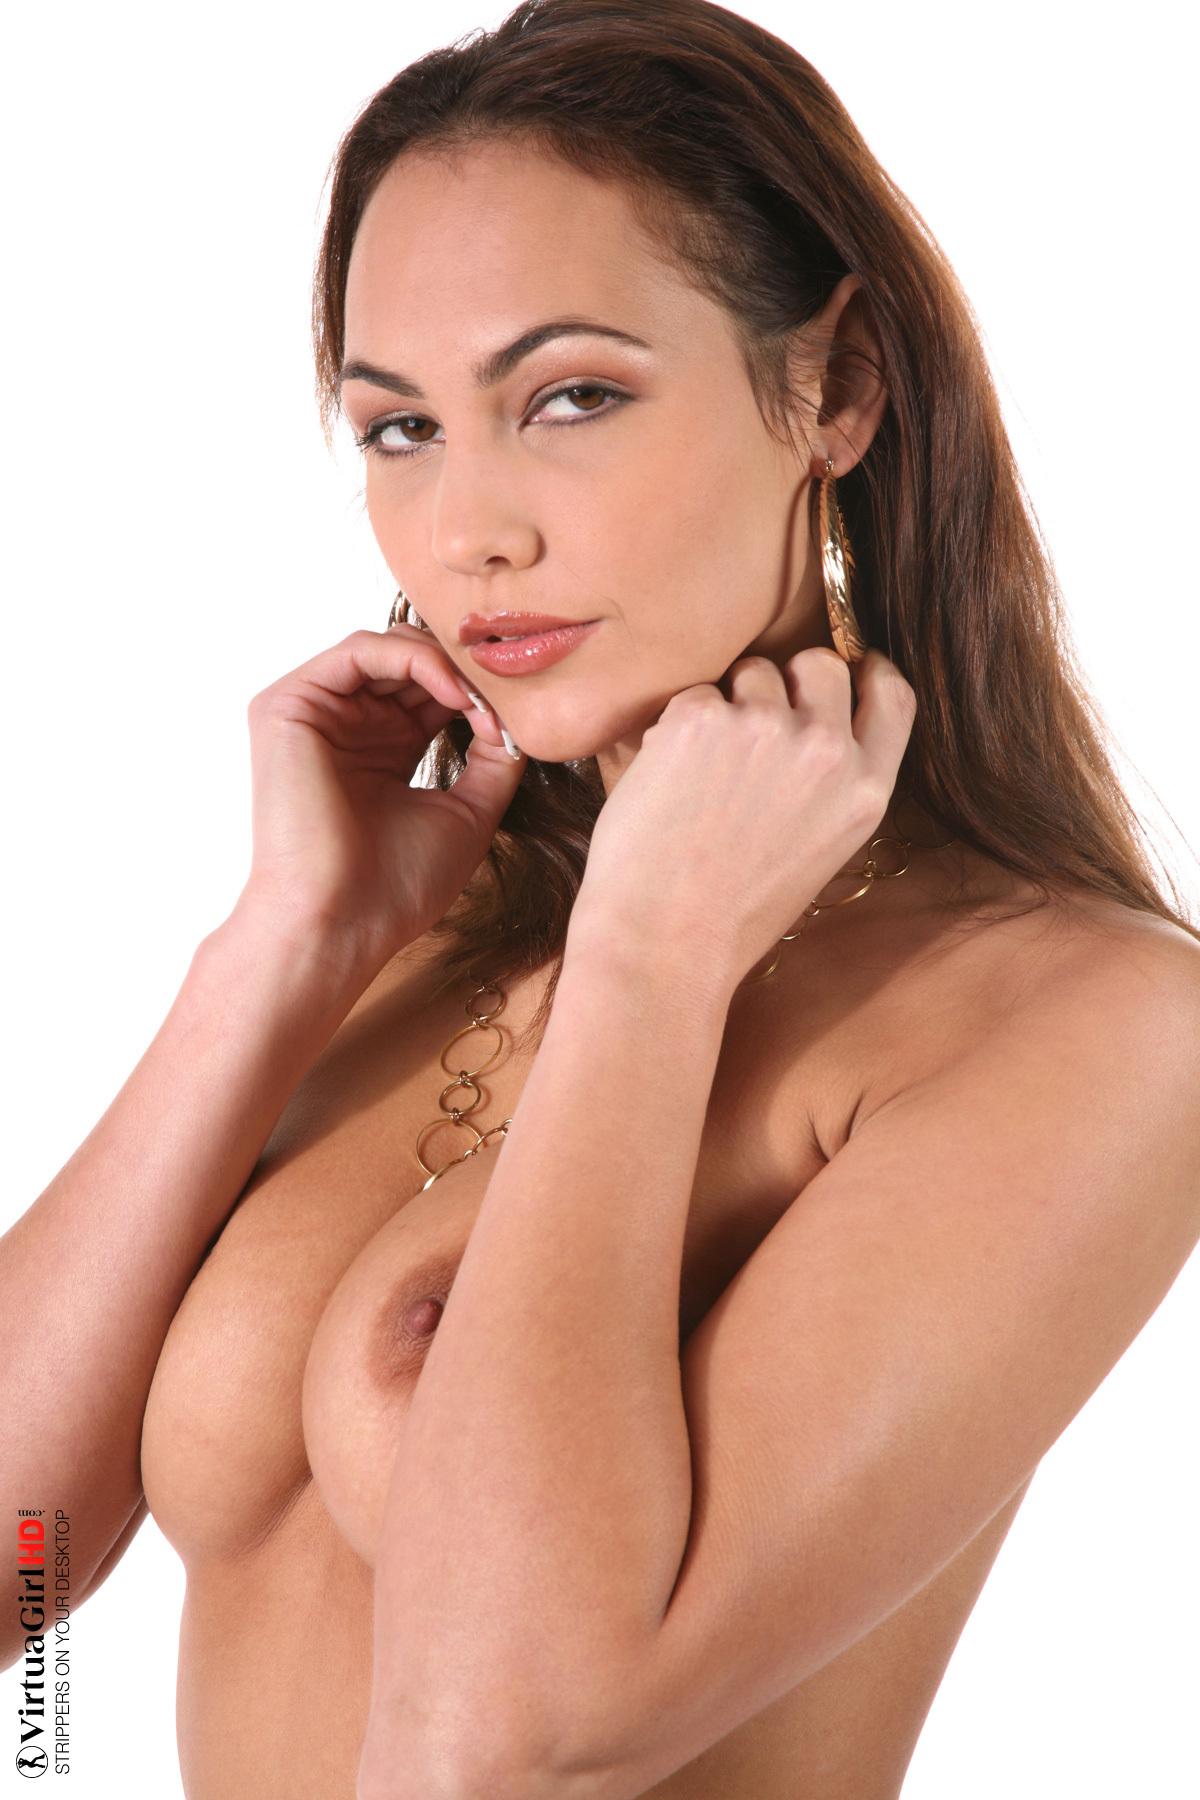 girls stripping nude video